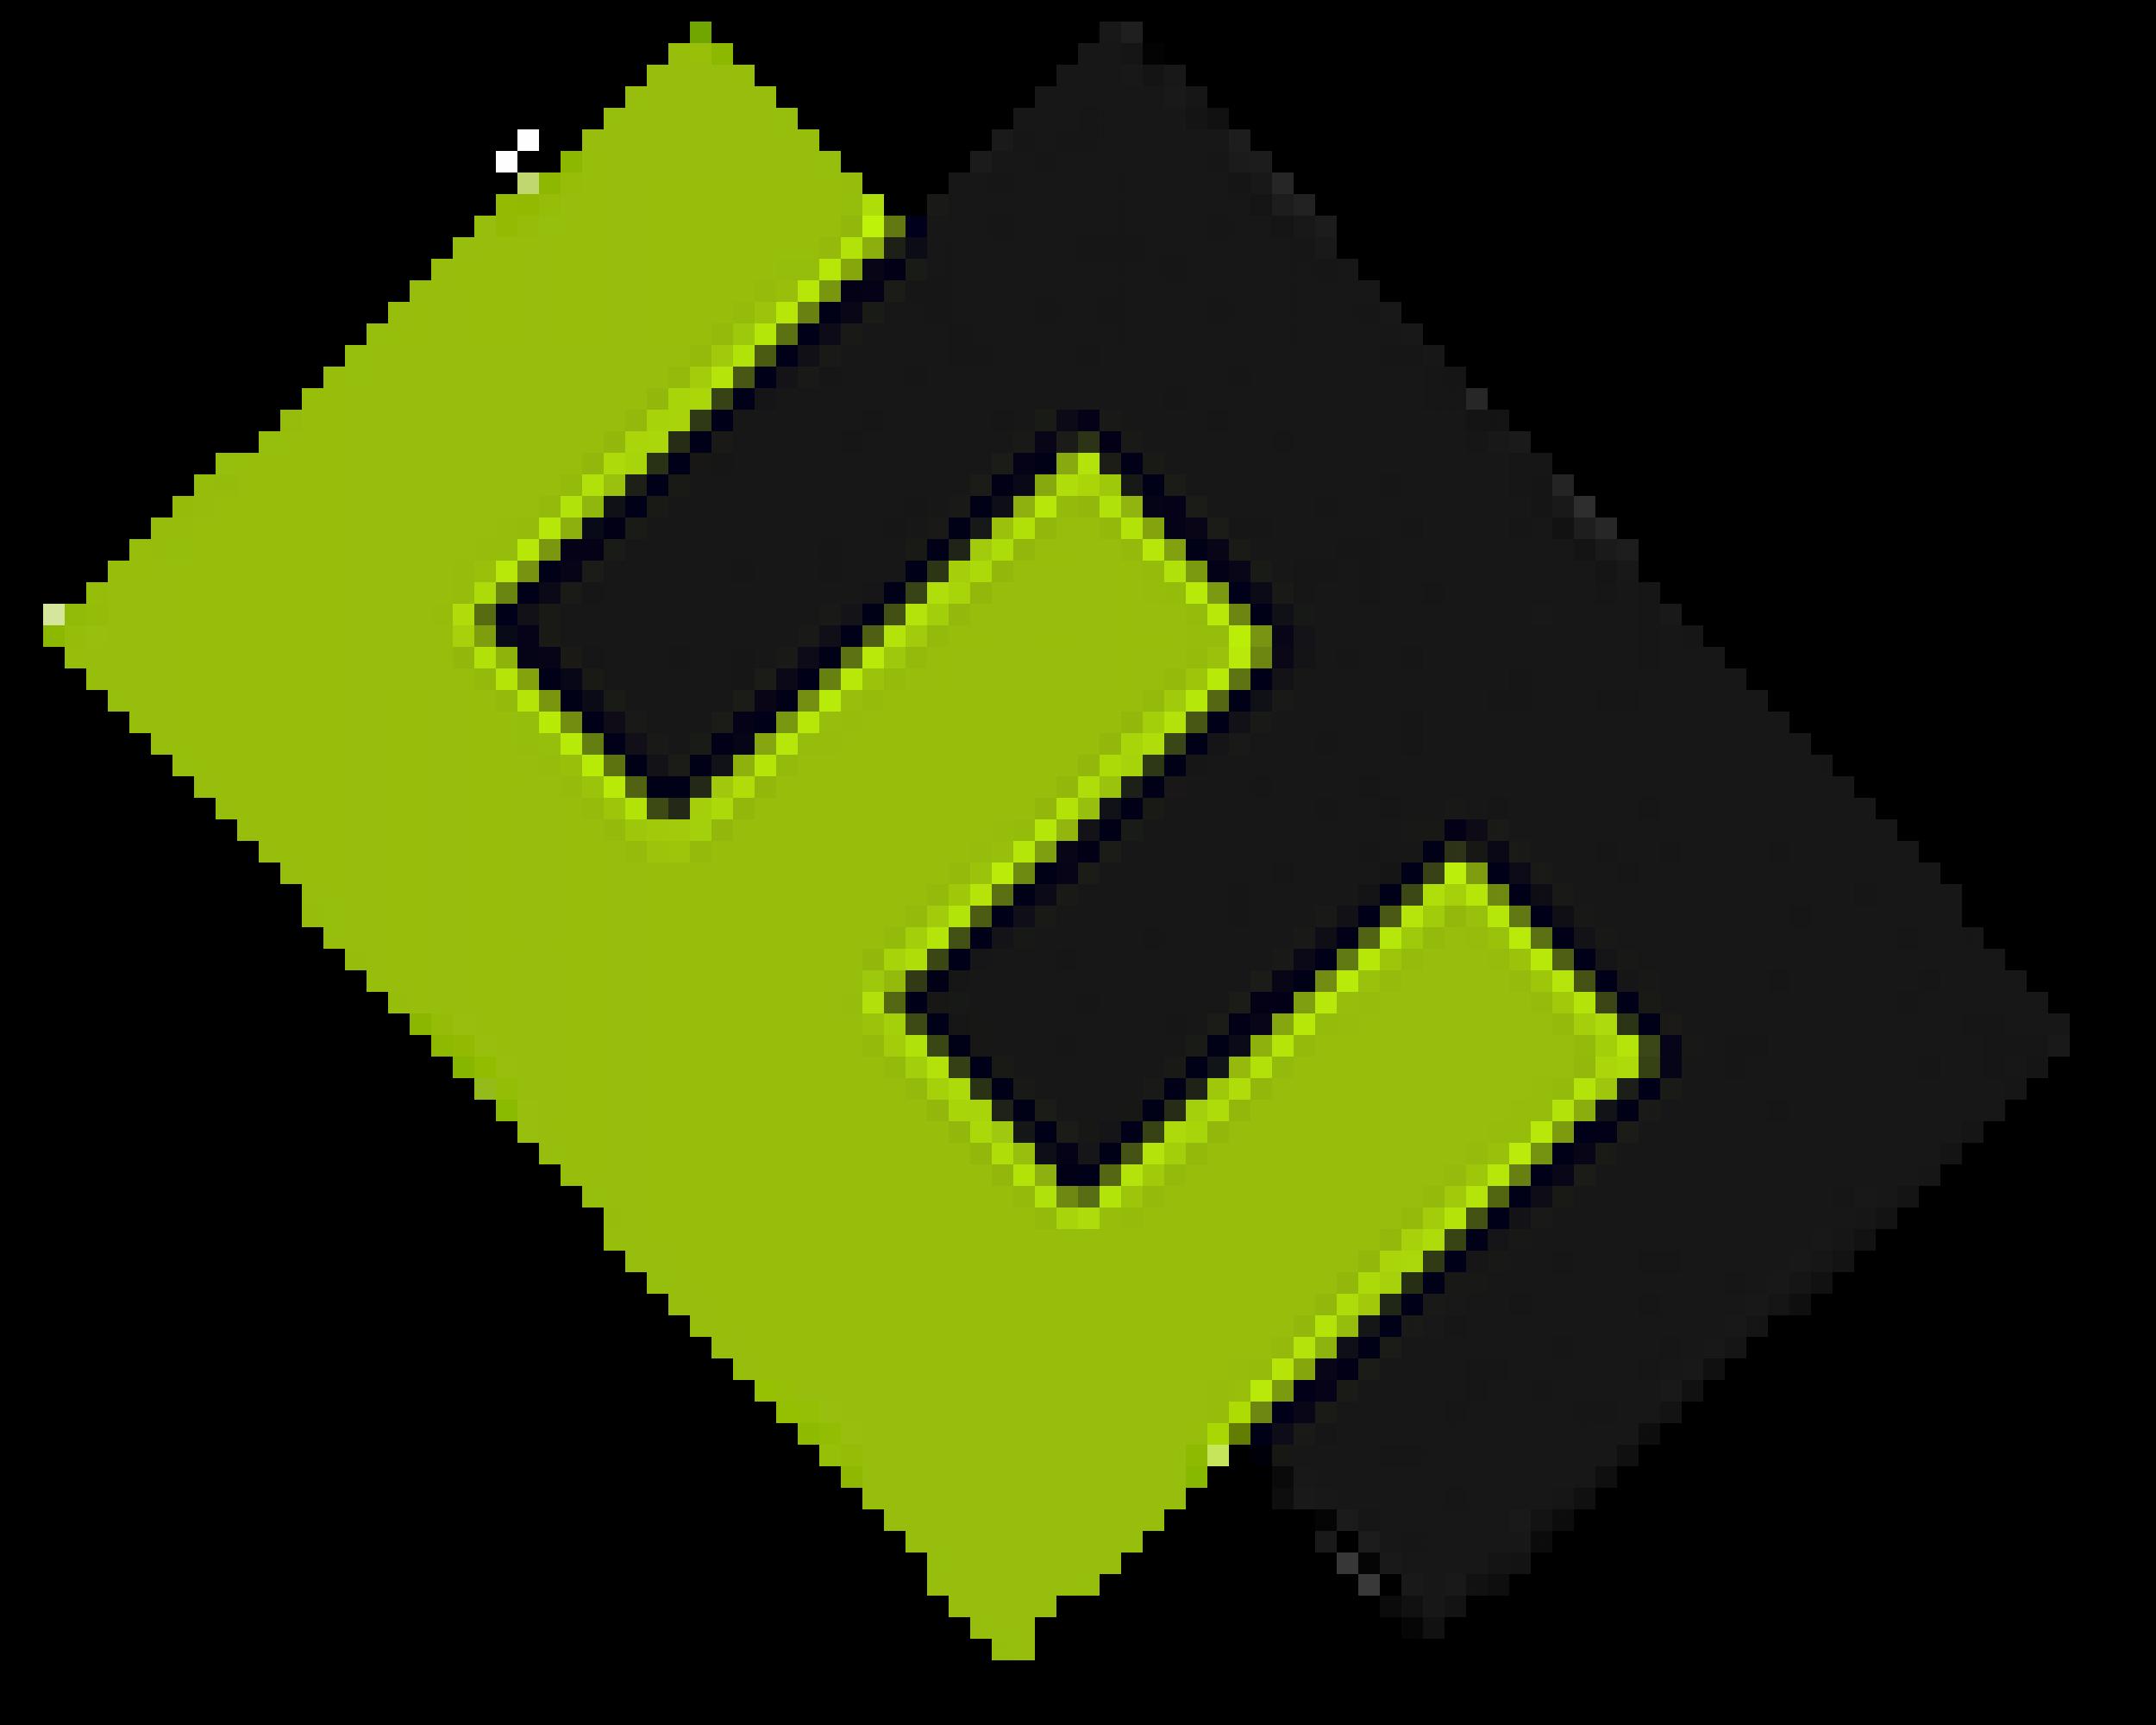 emlogo-xxsml-green